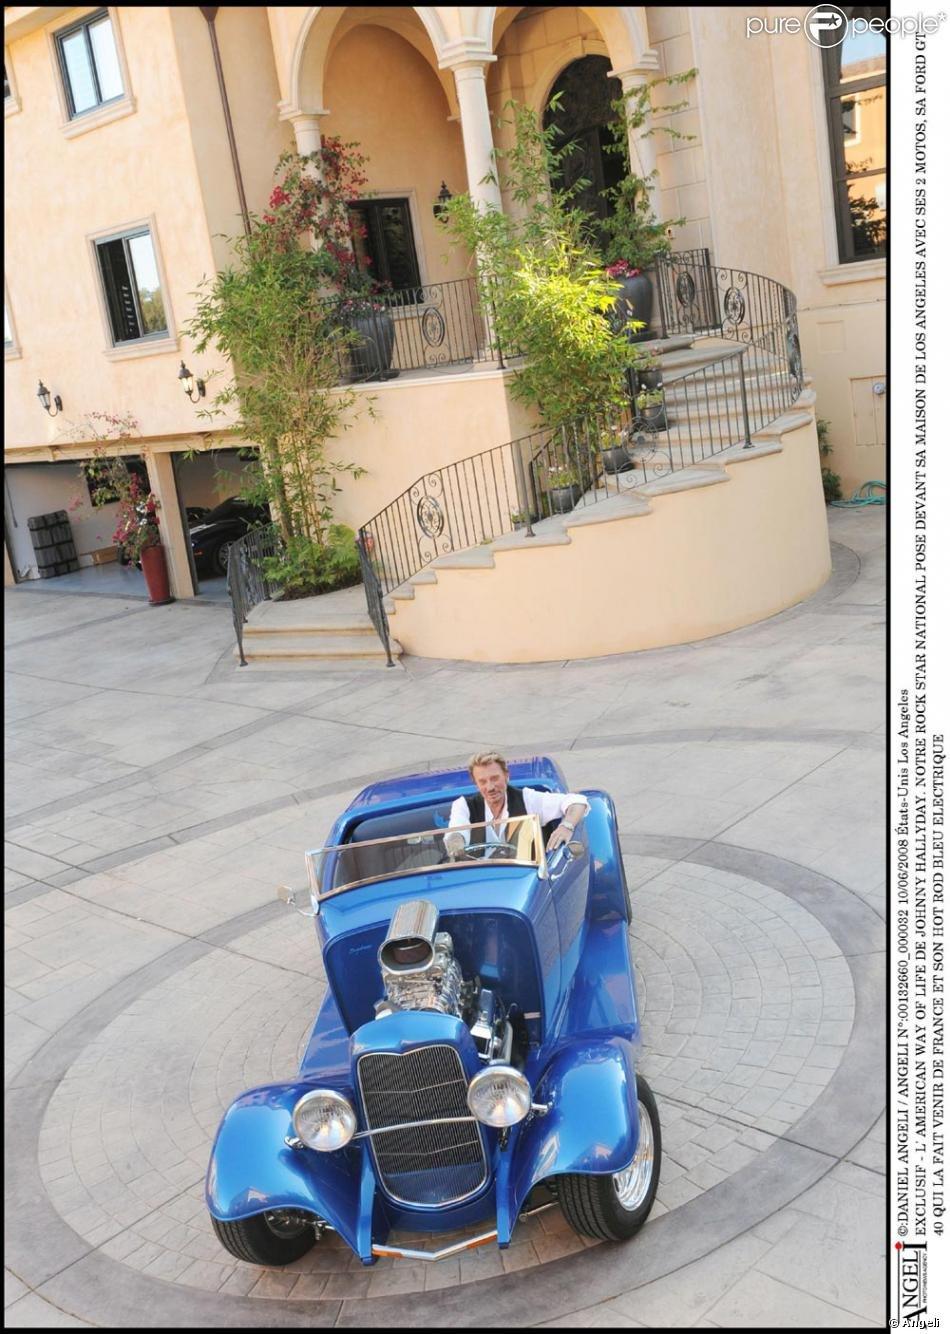 PROPRIETE OU A RESIDE JOHNNY HALLYDAY ( 7/10 ) 'BEVERLY GLEN, LOS ANGELES'( 2007 21030502151320723